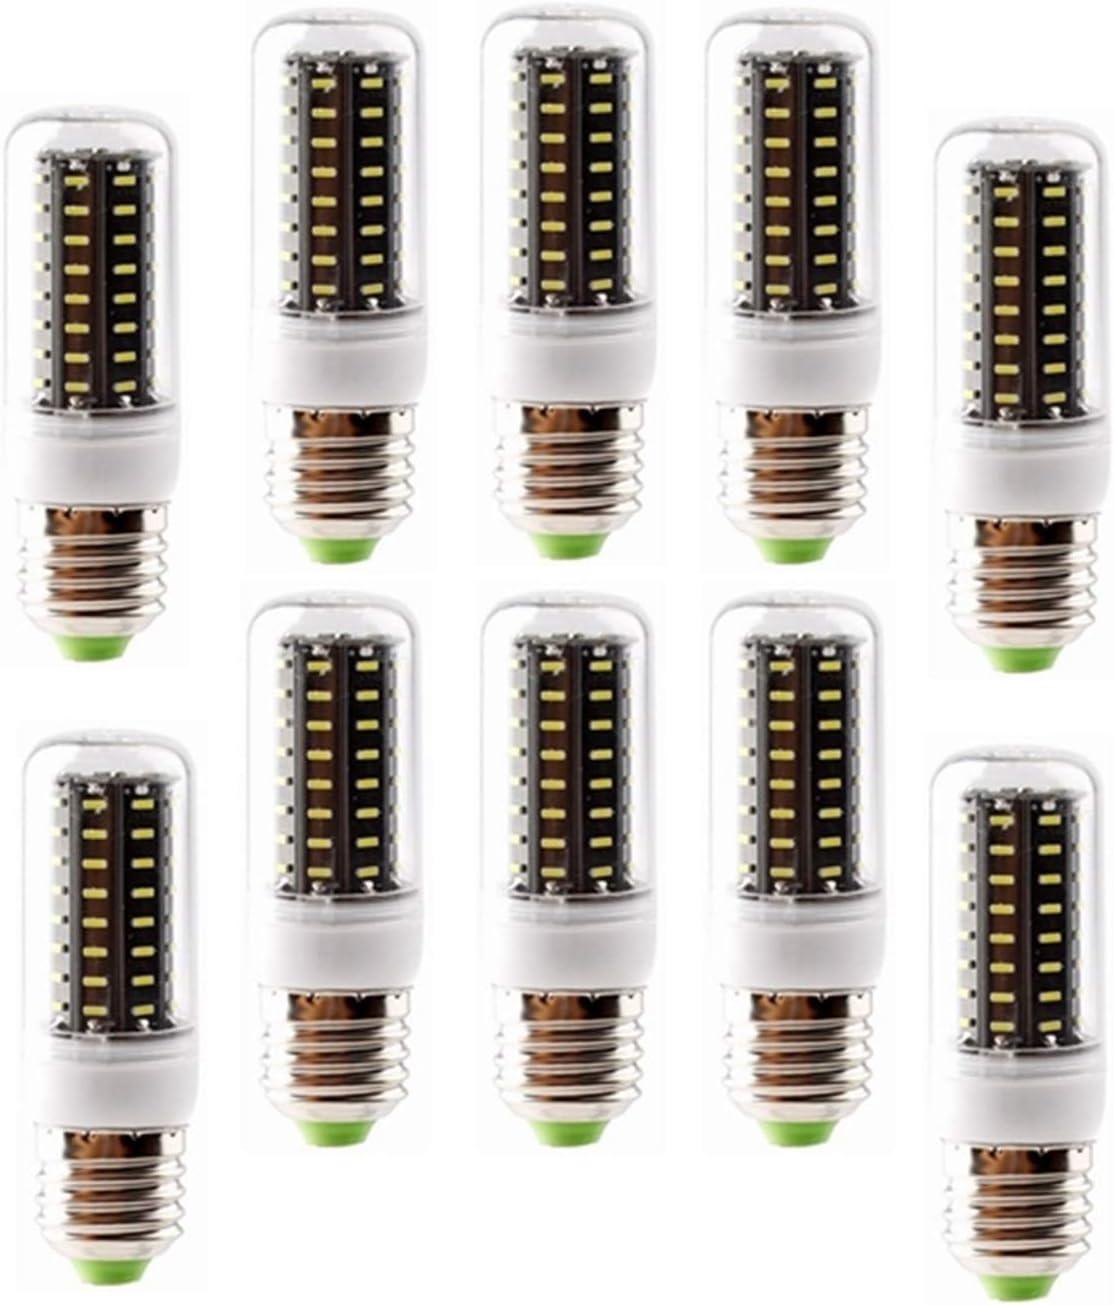 Corn Light E26 Sales results No. 1 E27 LED Bulbs Lumens Very popular 9W 720 Incandescent